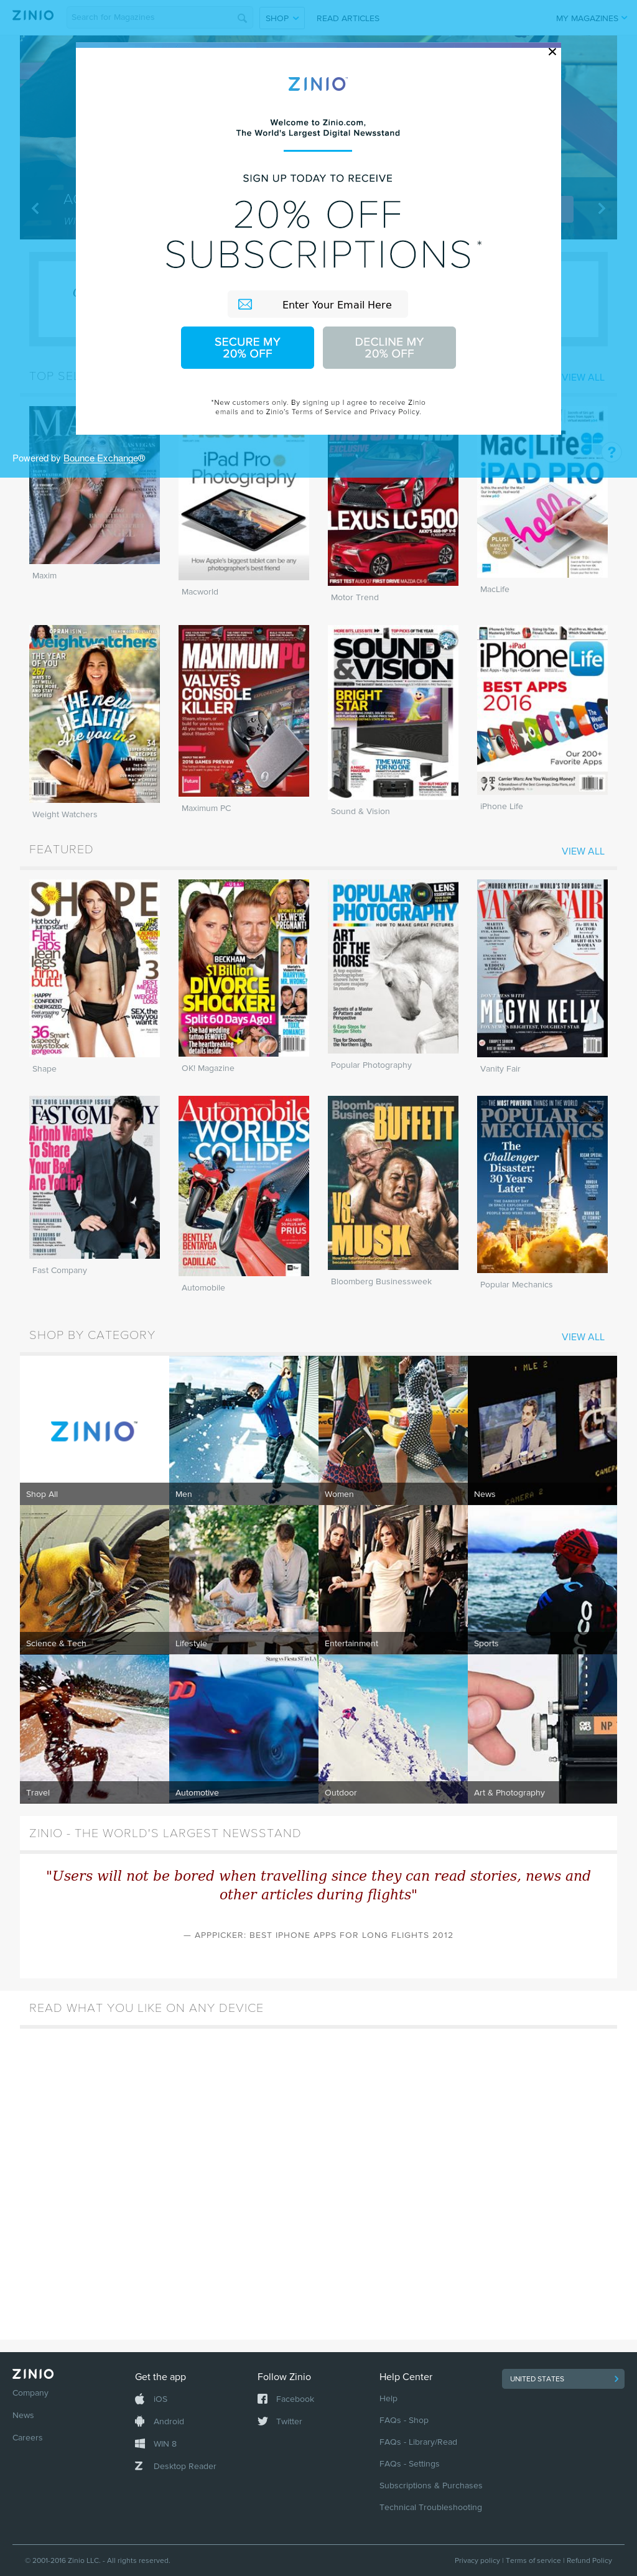 Zinio Competitors, Revenue and Employees - Owler Company Profile